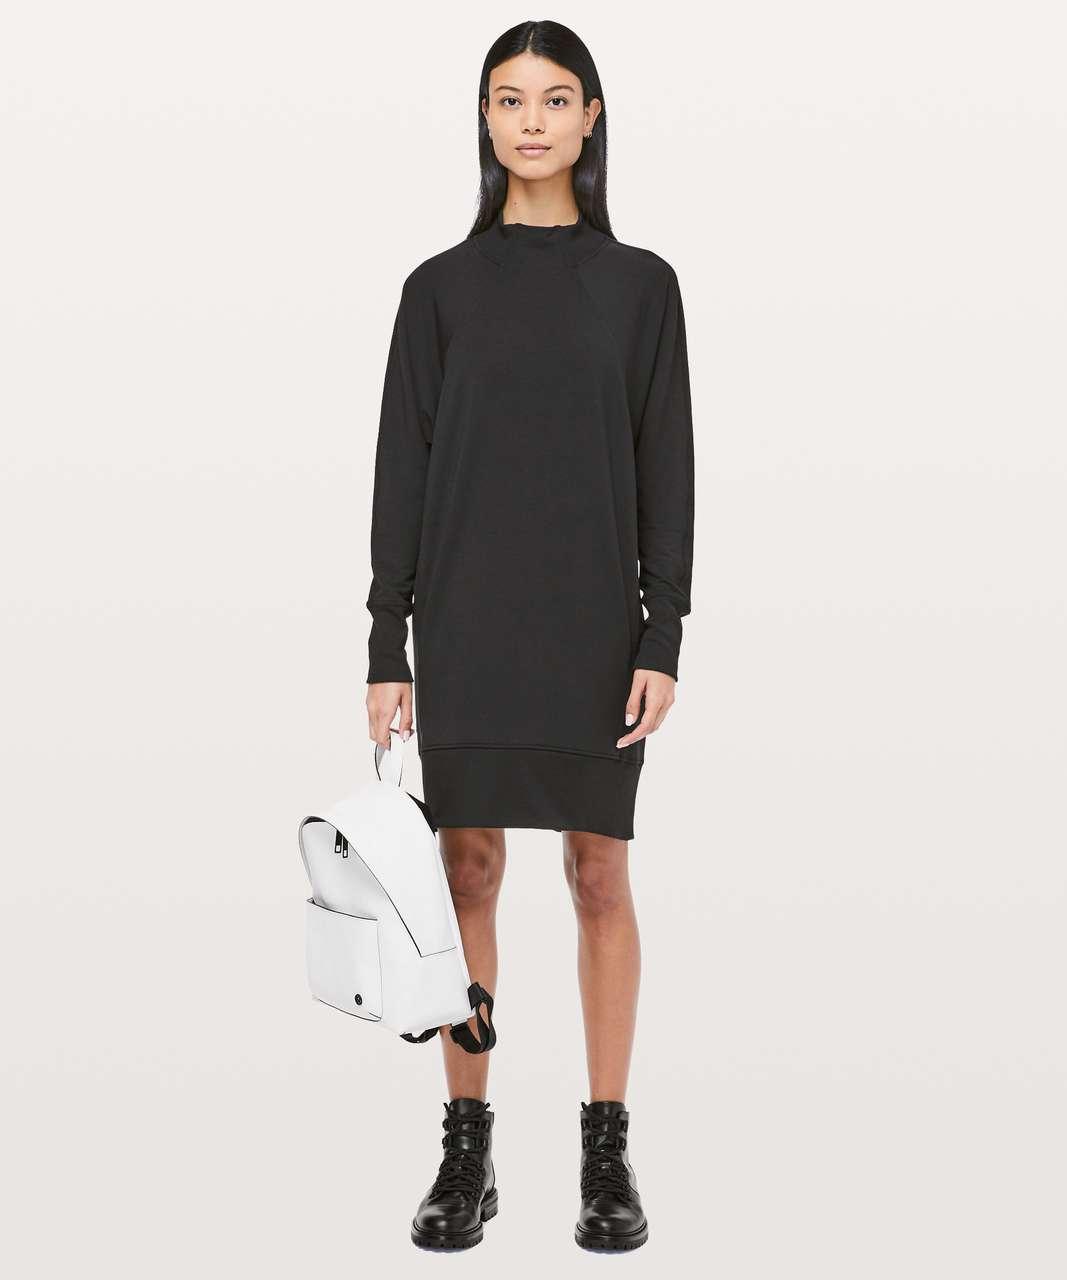 Lululemon Cozy Instincts Dress - Black